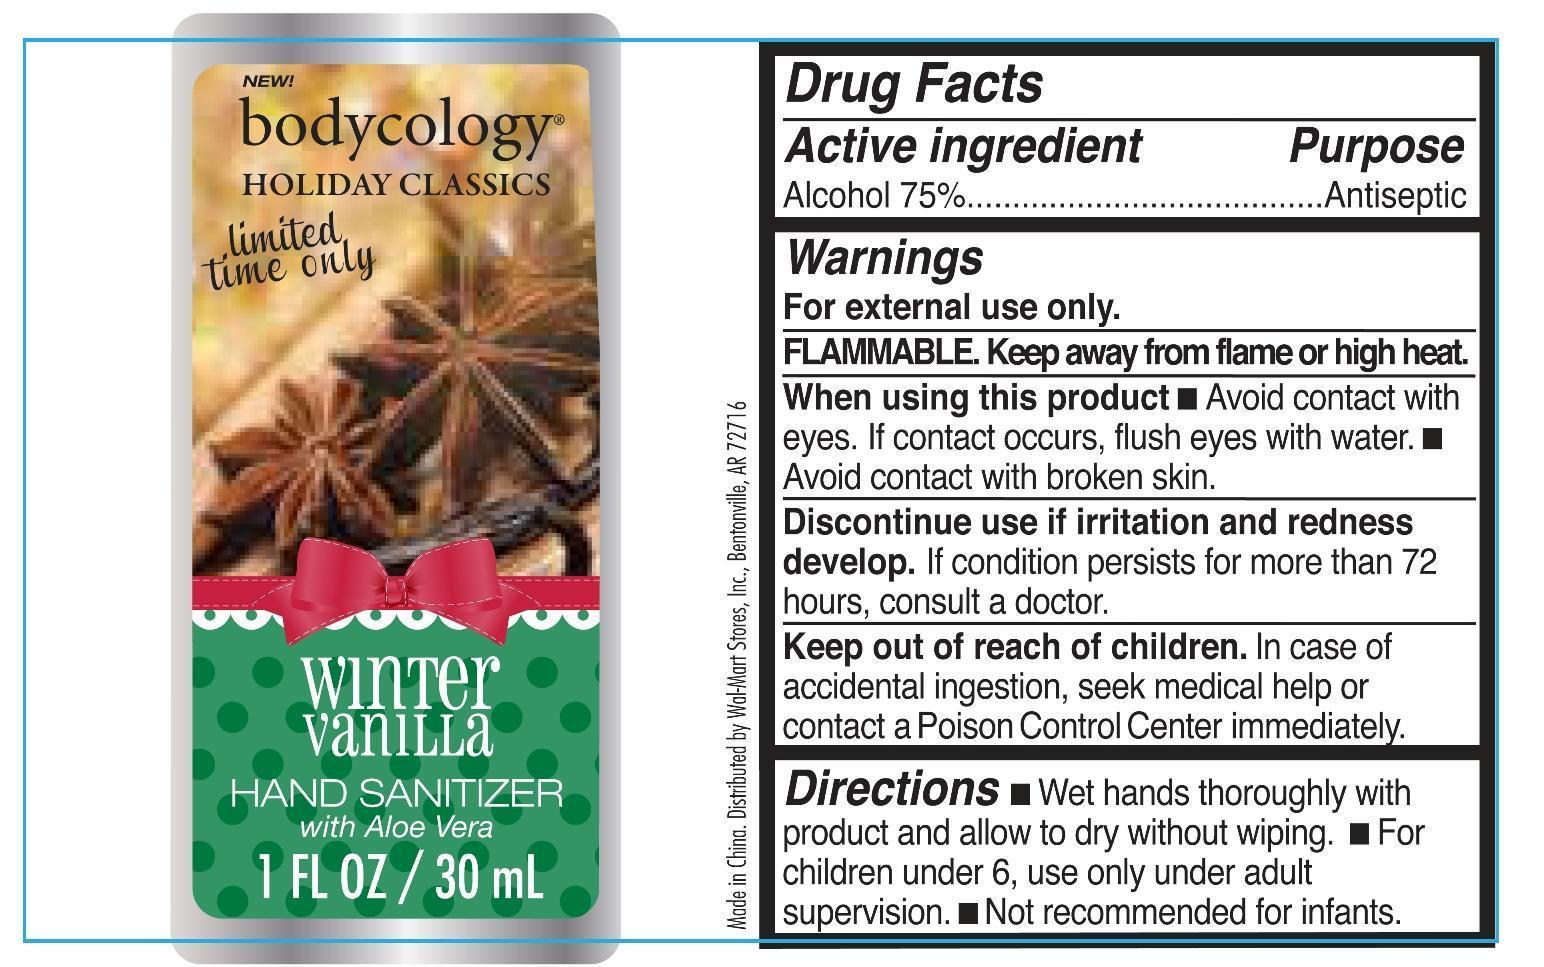 Winter Vanilla Hand Sanitizer Bodycology (Alcohol) Liquid [Wal-mart Stores Inc]